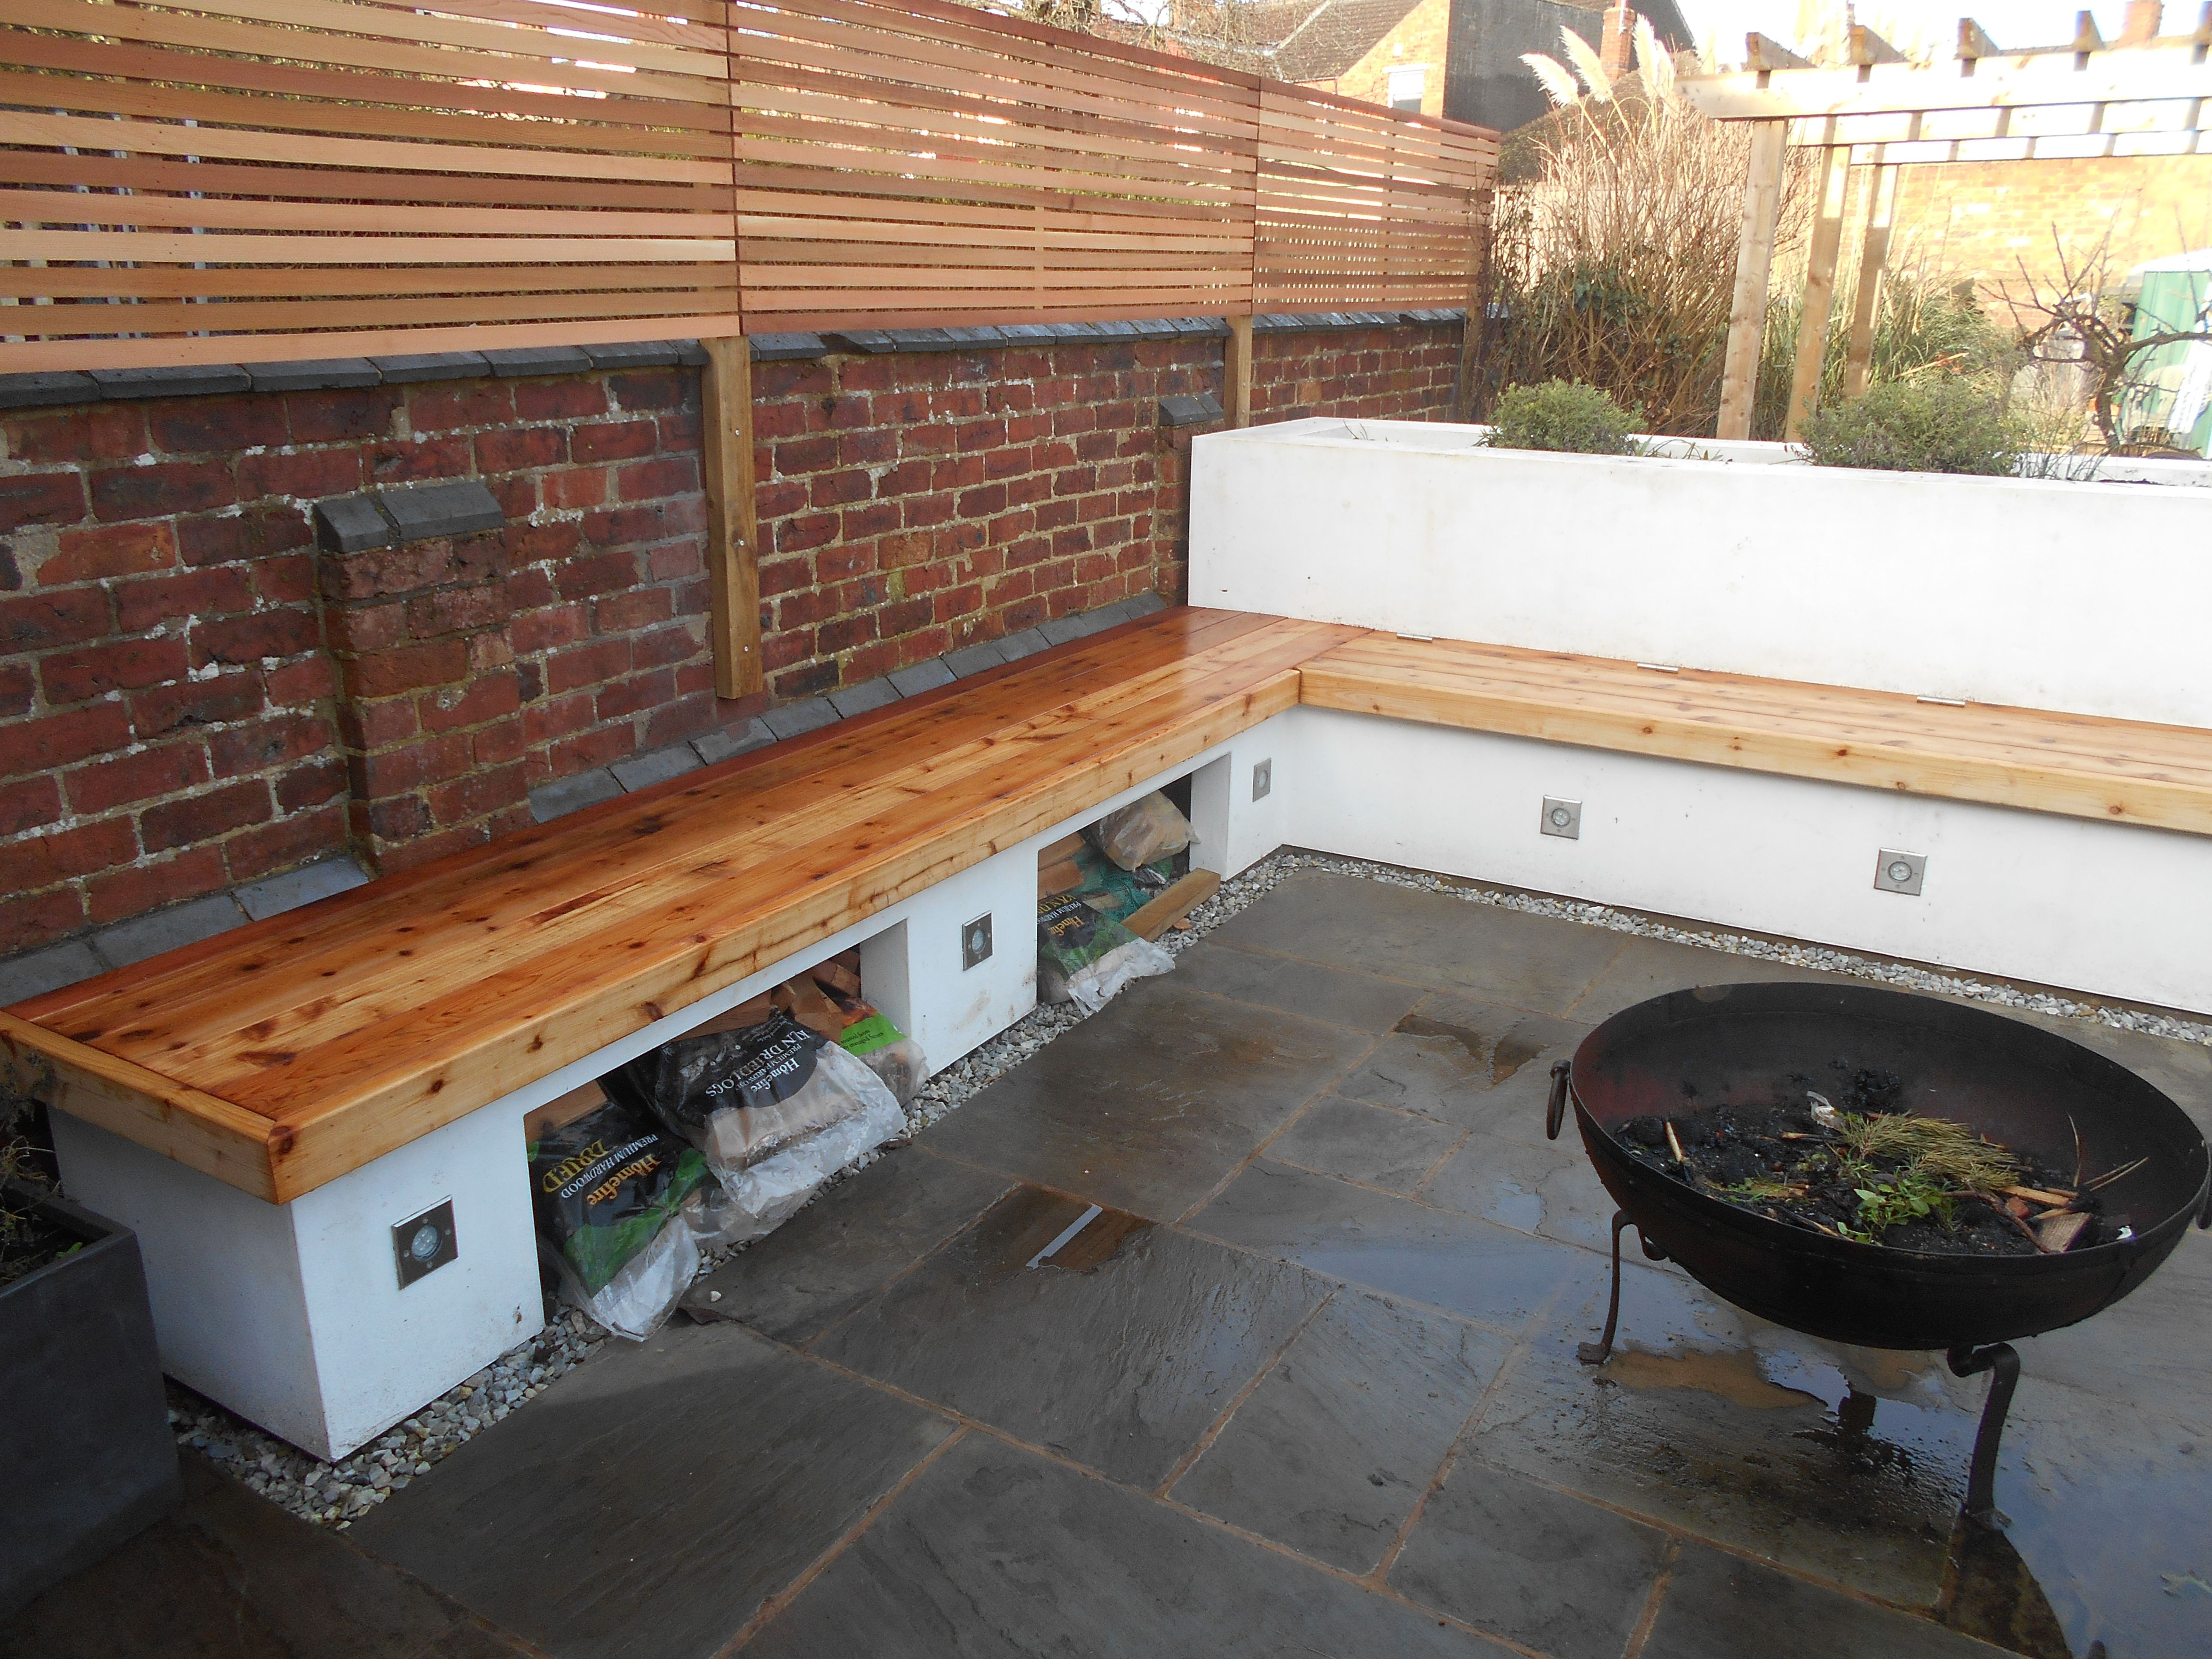 Cedar Screening And Bench, Built In Wood Storage.